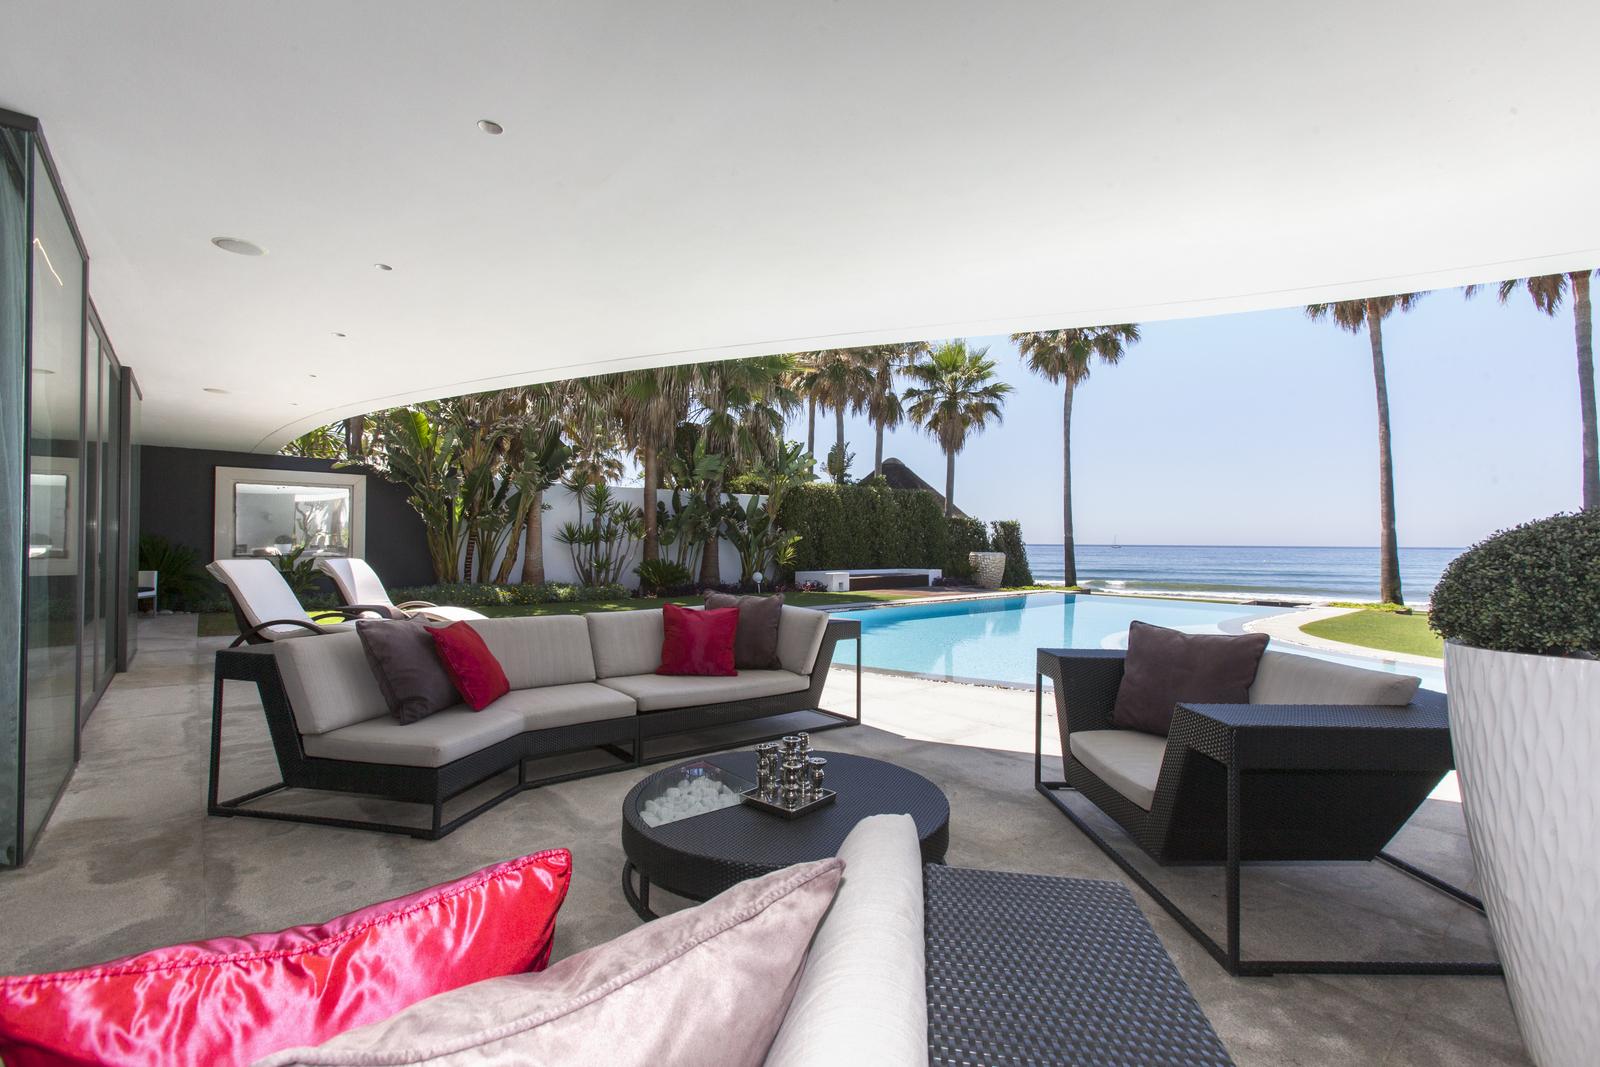 Los Monteros, Contemporary Beachfront Jewel